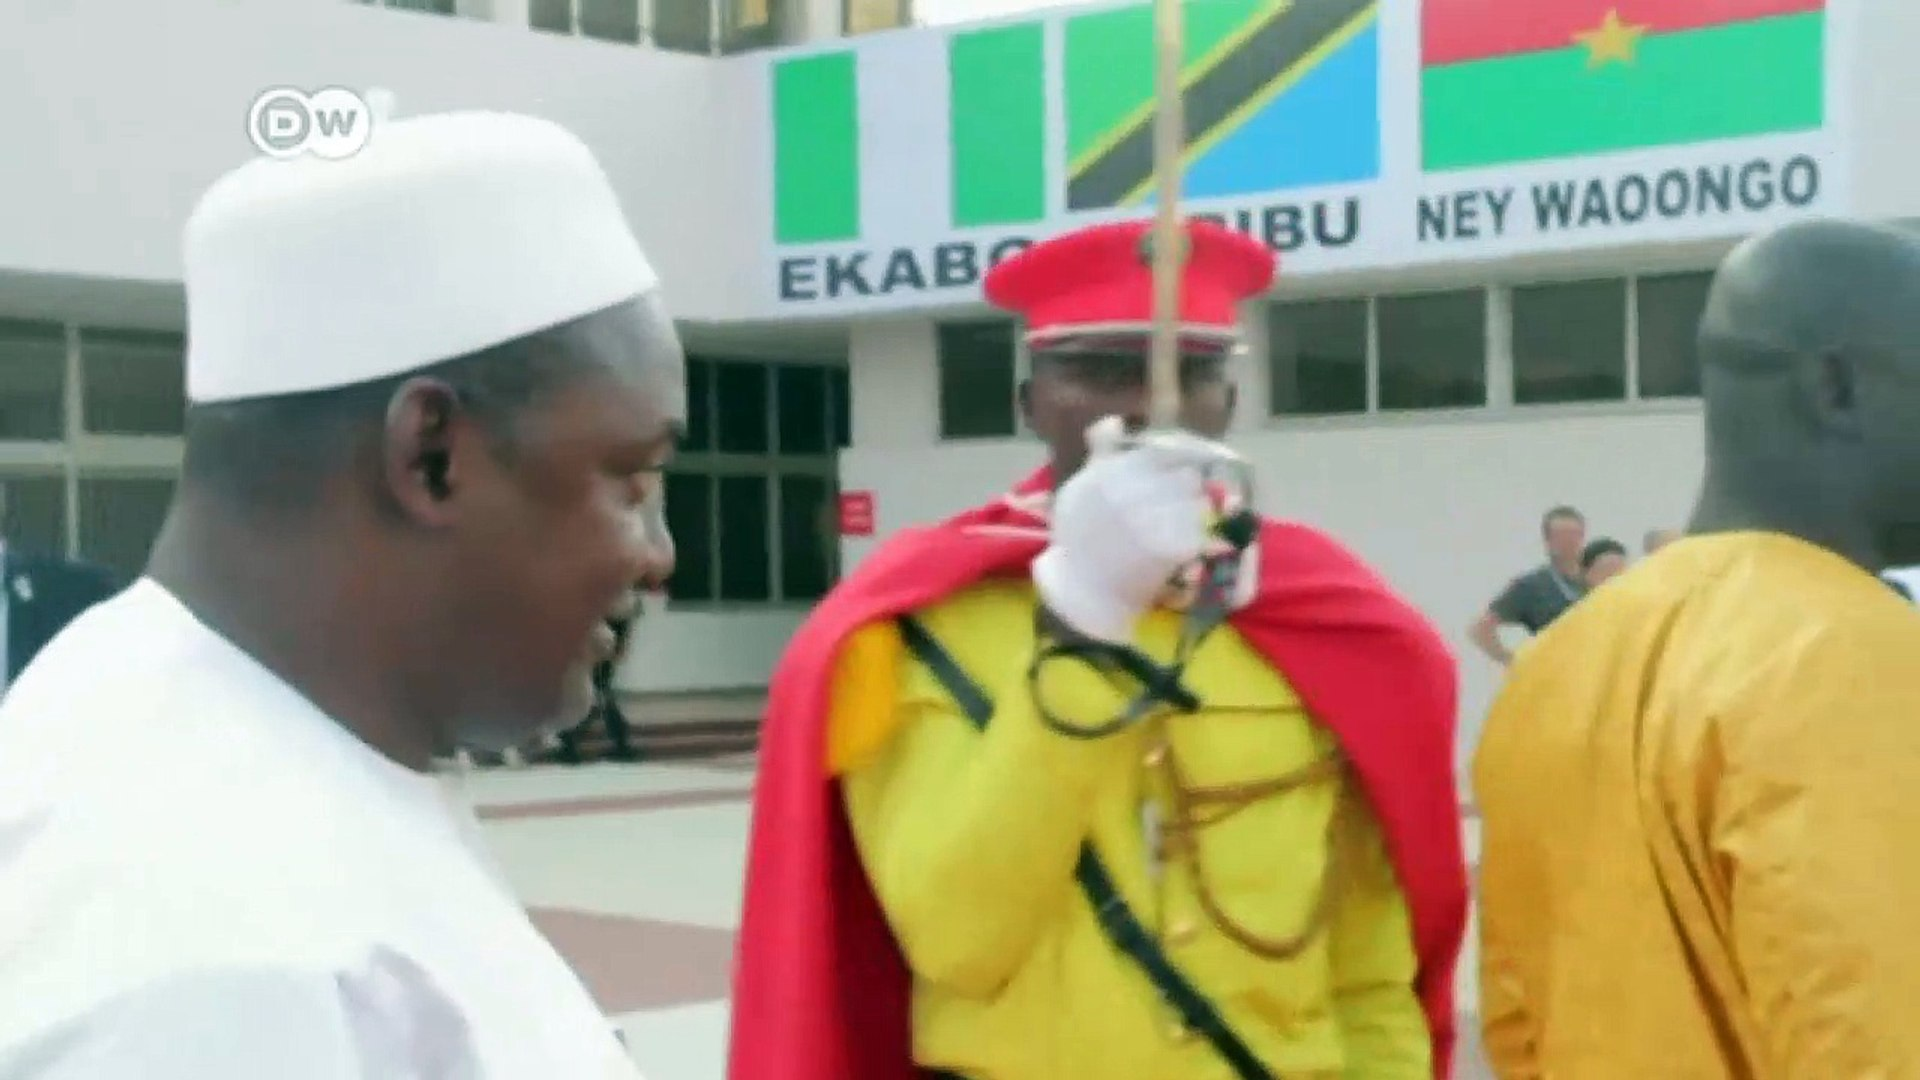 The Gambia faces political turmoil   DW News